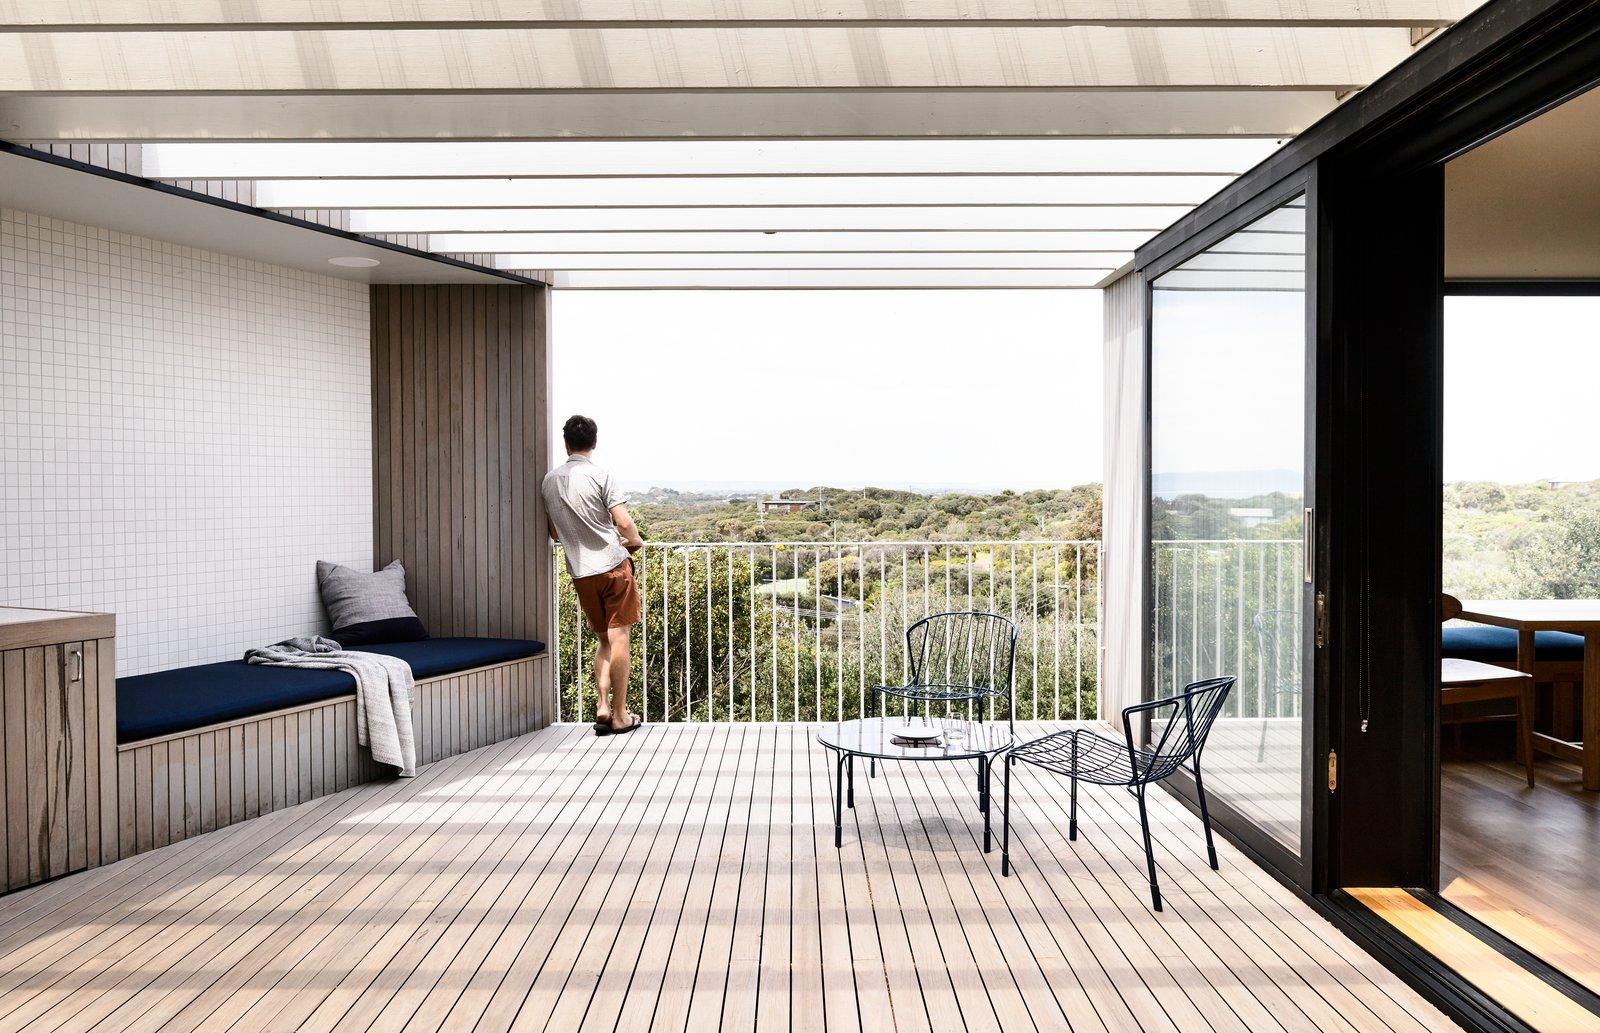 Sorrento House Figureground Architecture Deck